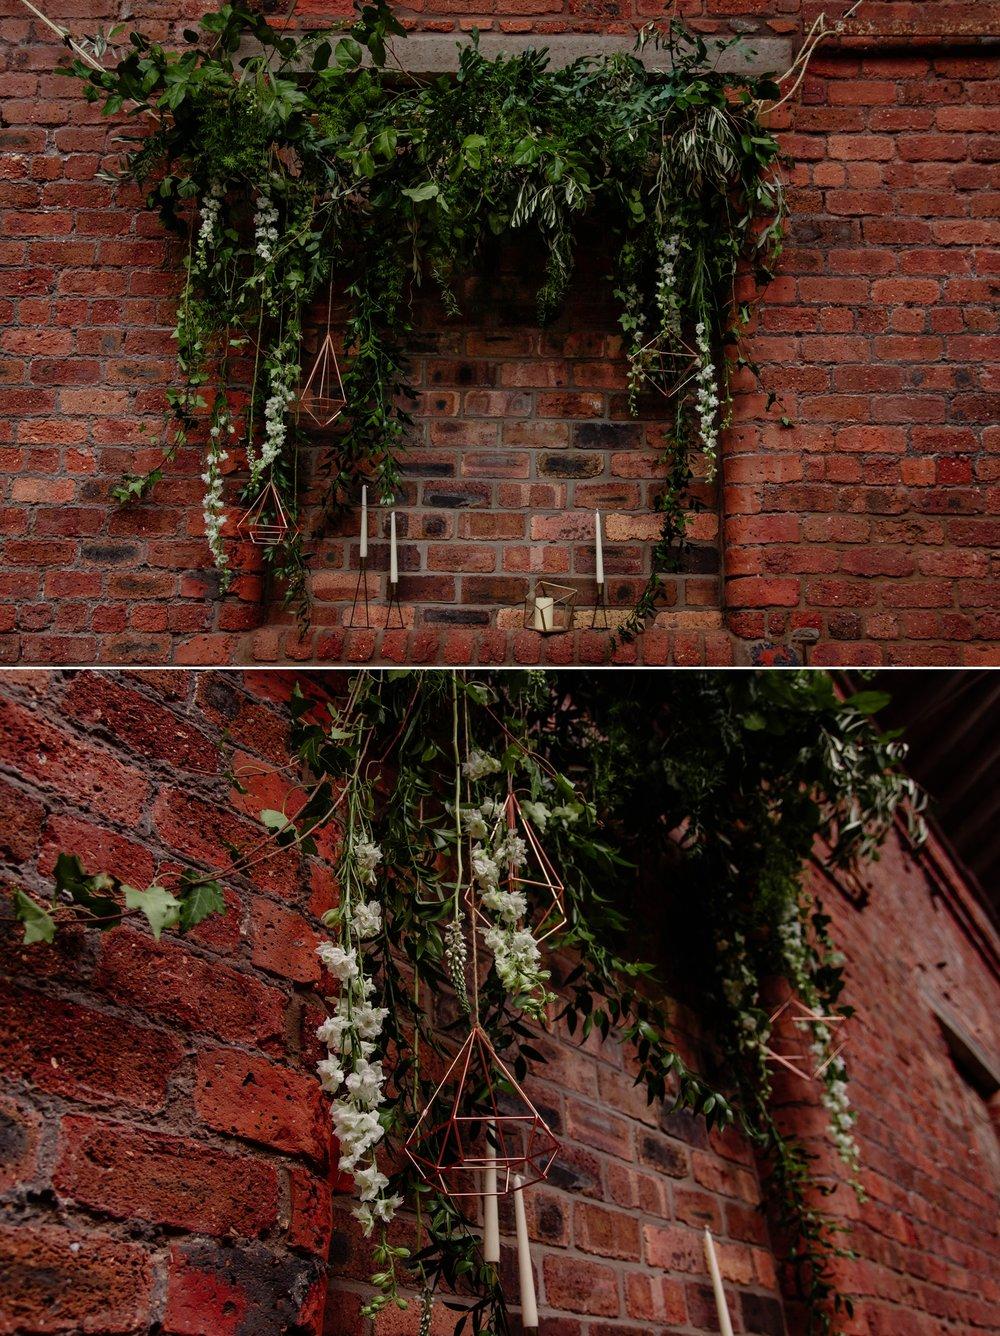 engine-works-wedding-styled-shoot-fotomaki-photography-50.jpg